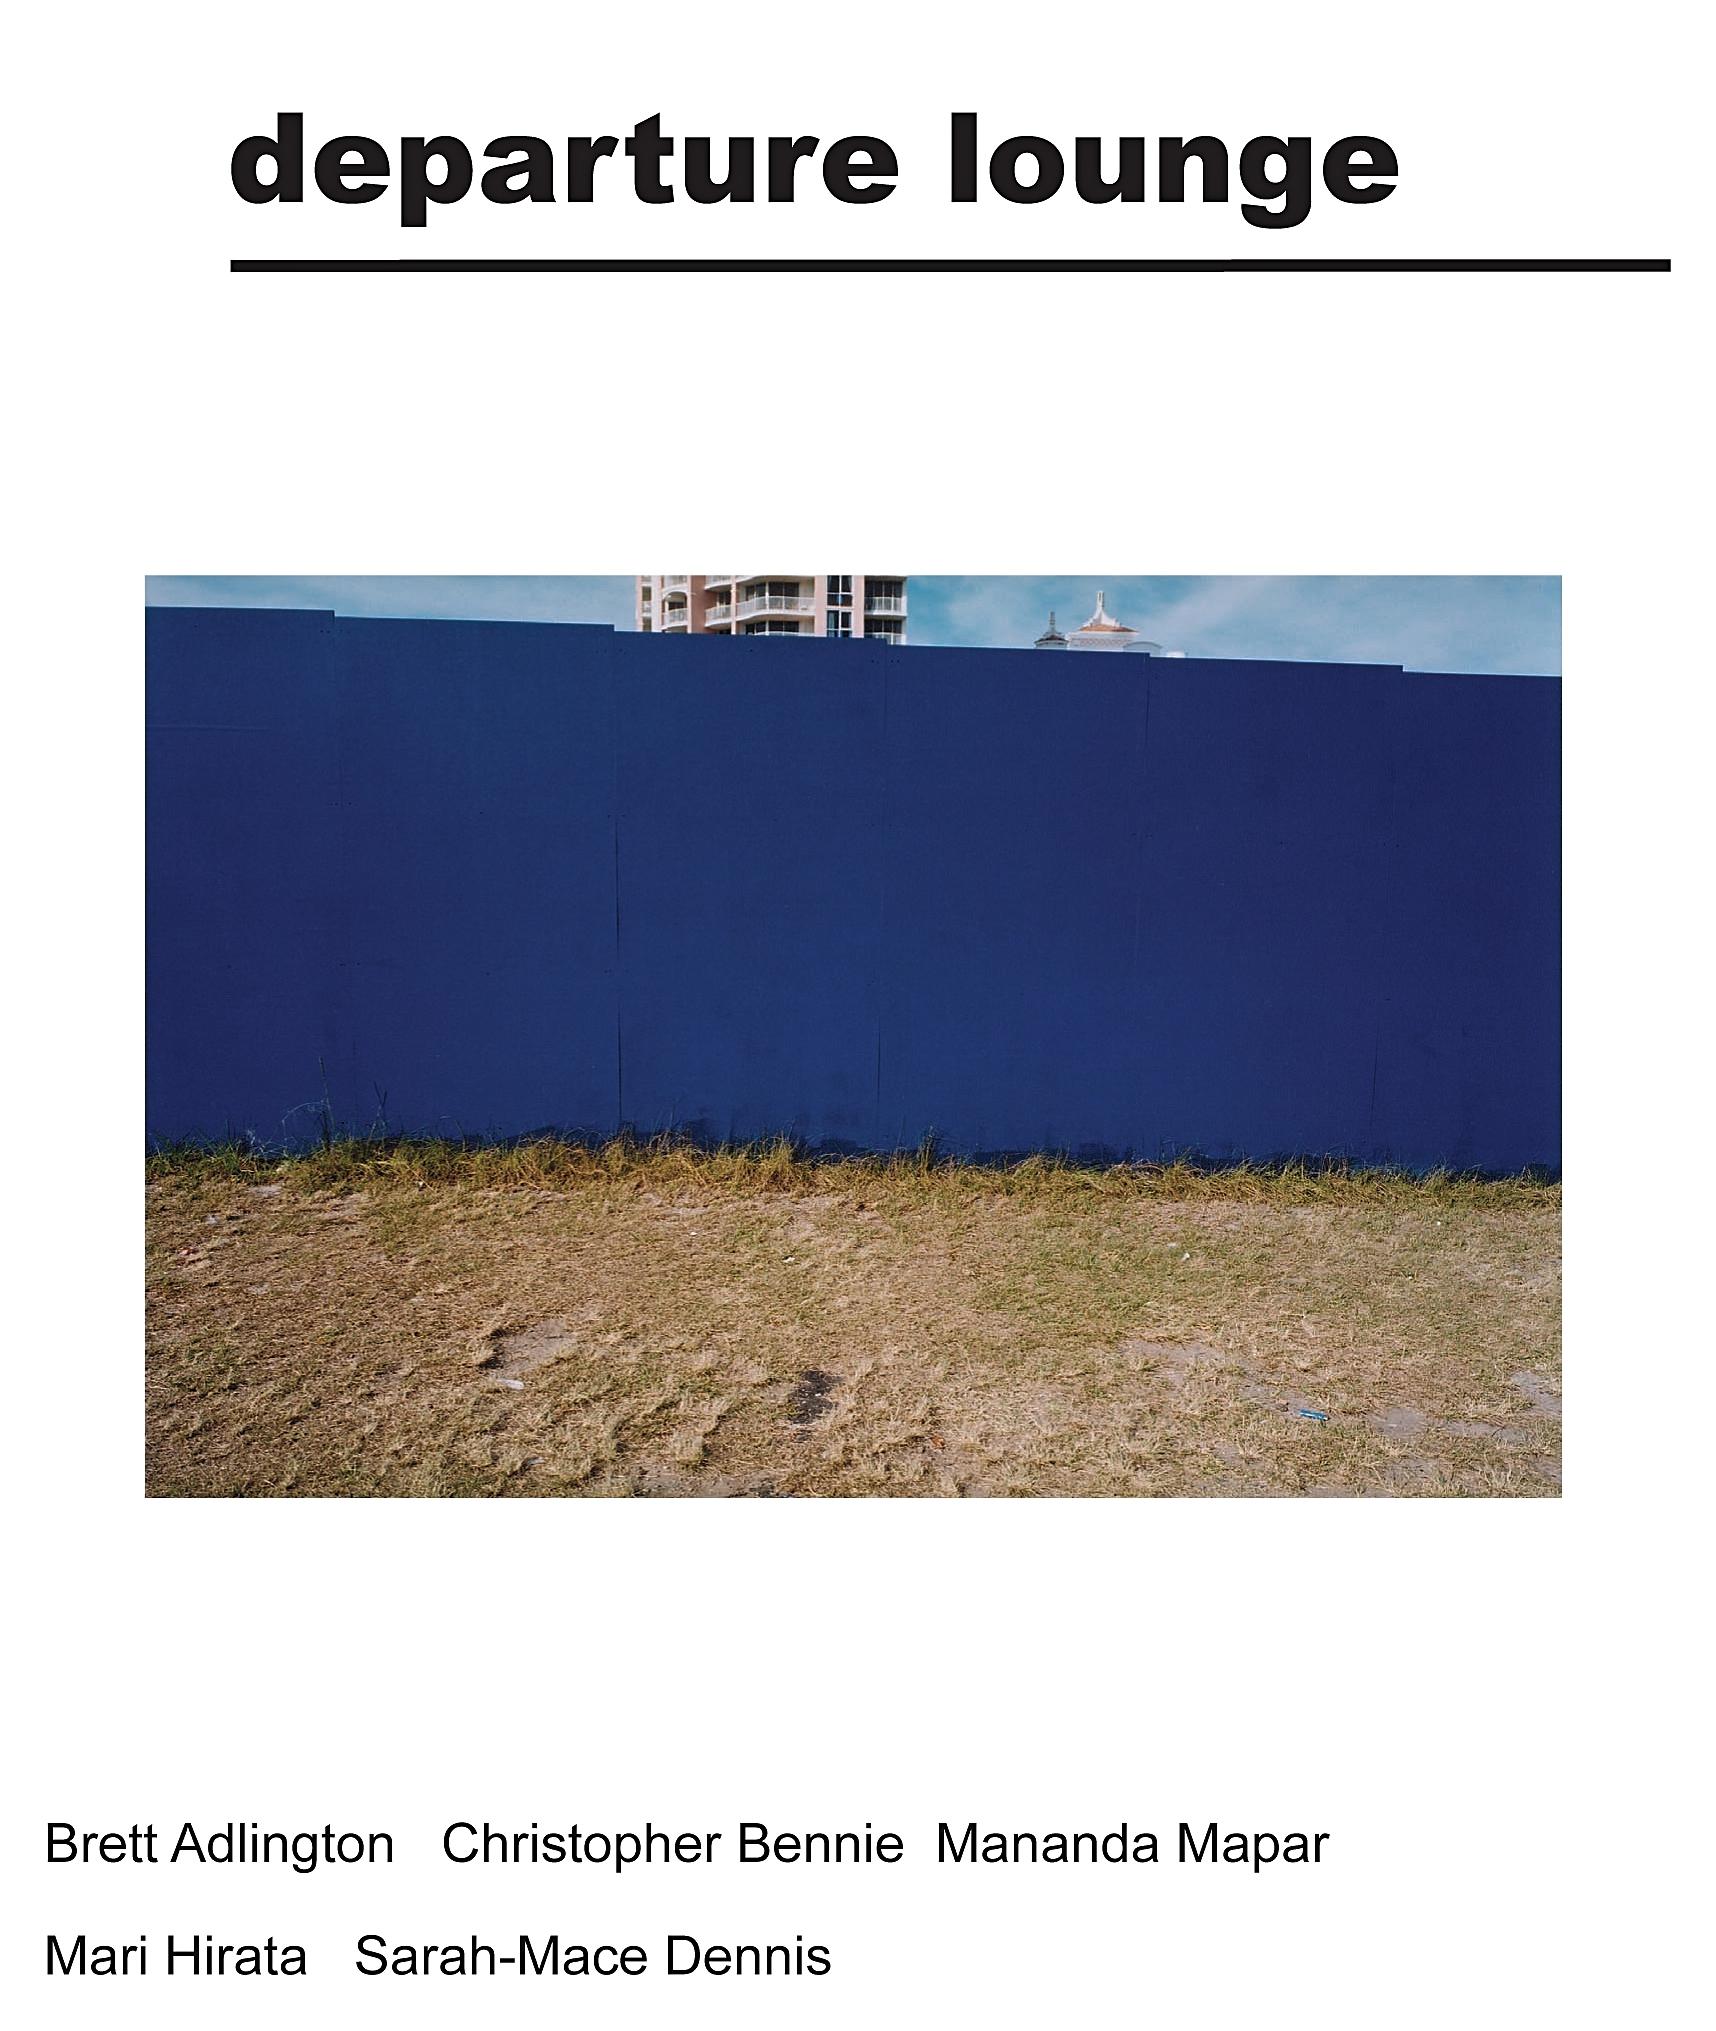 2004_Departure Lounge_Cover_Fotor.jpg